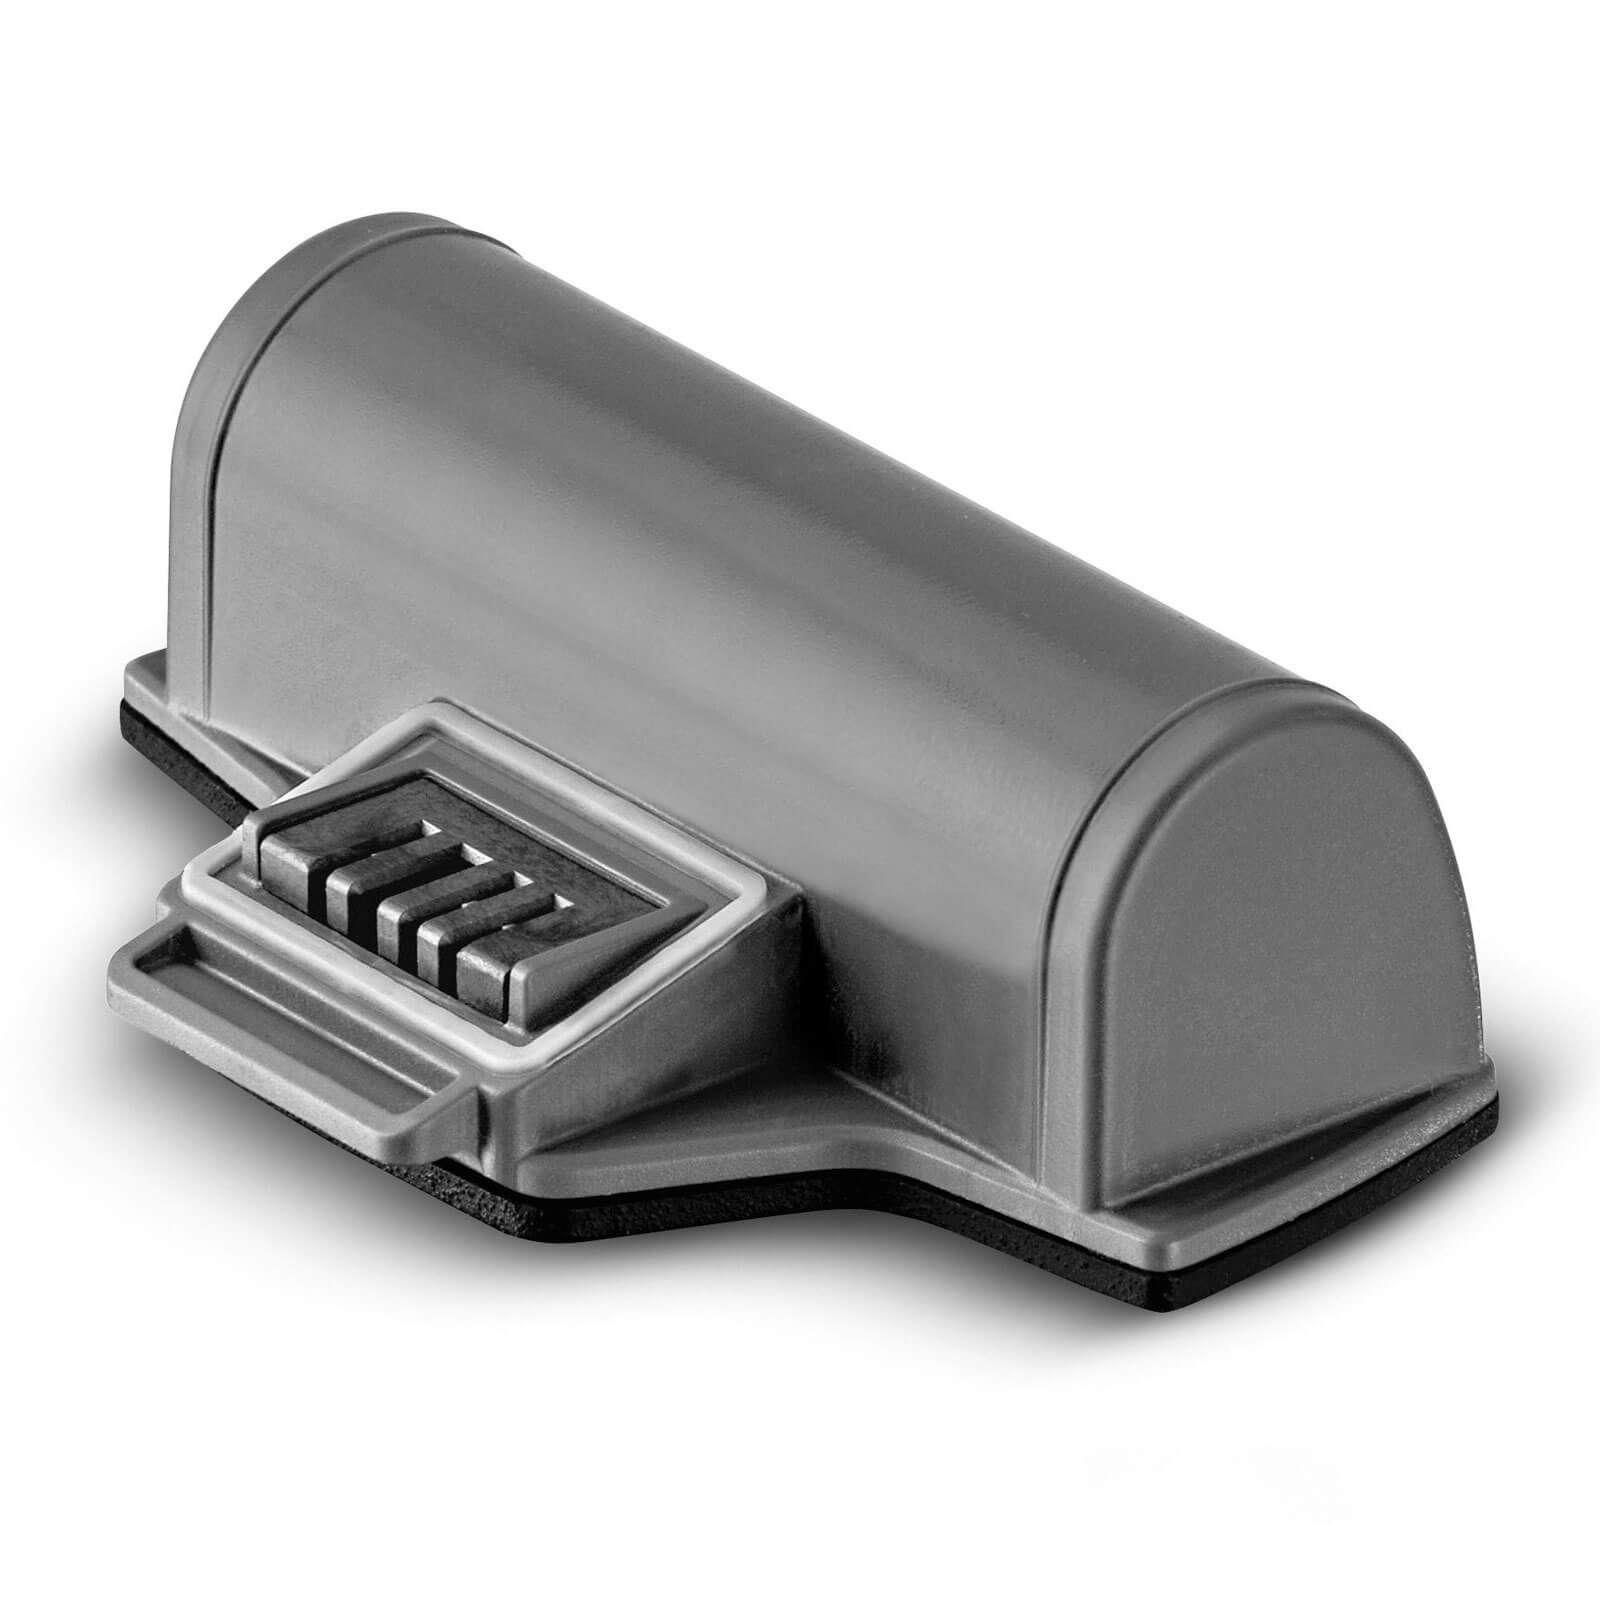 Karcher Genuine Li-ion Battery for WV 5 Window Vacs